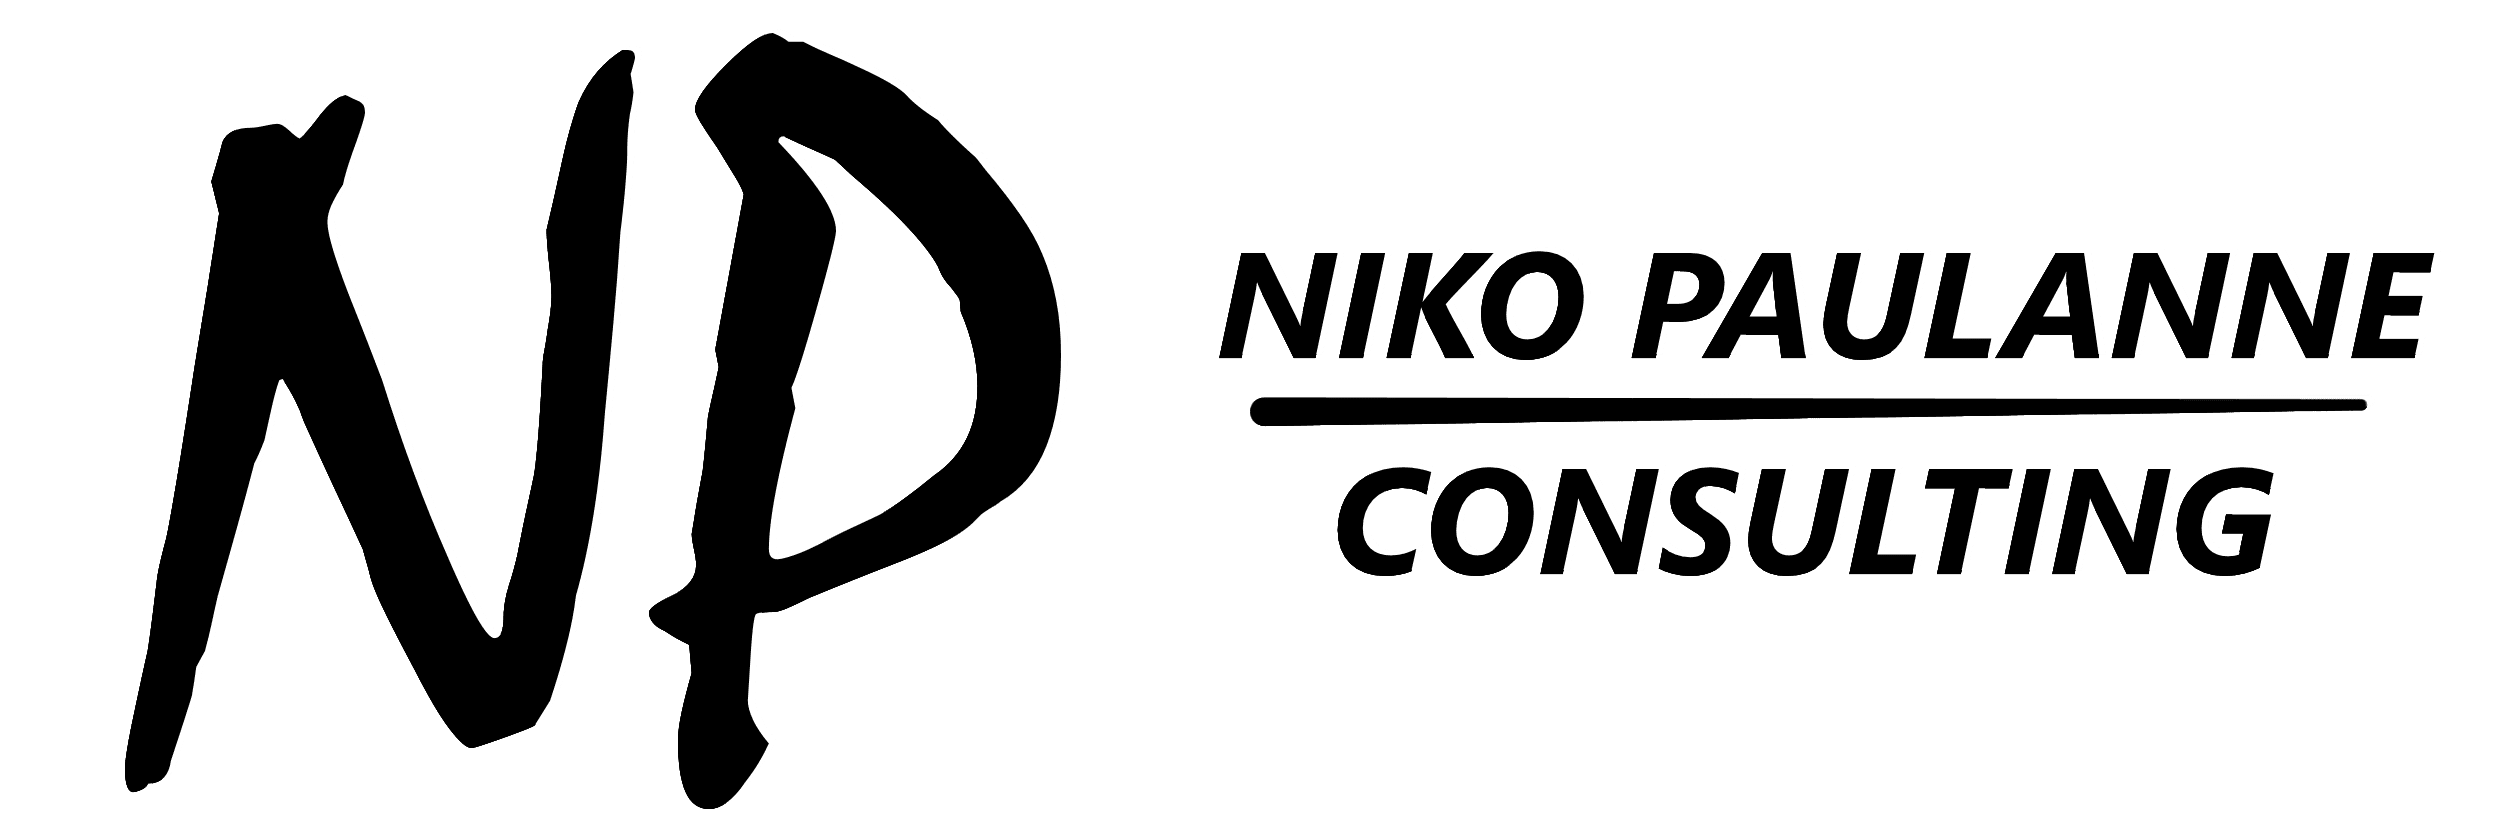 Niko Paulanne Consulting